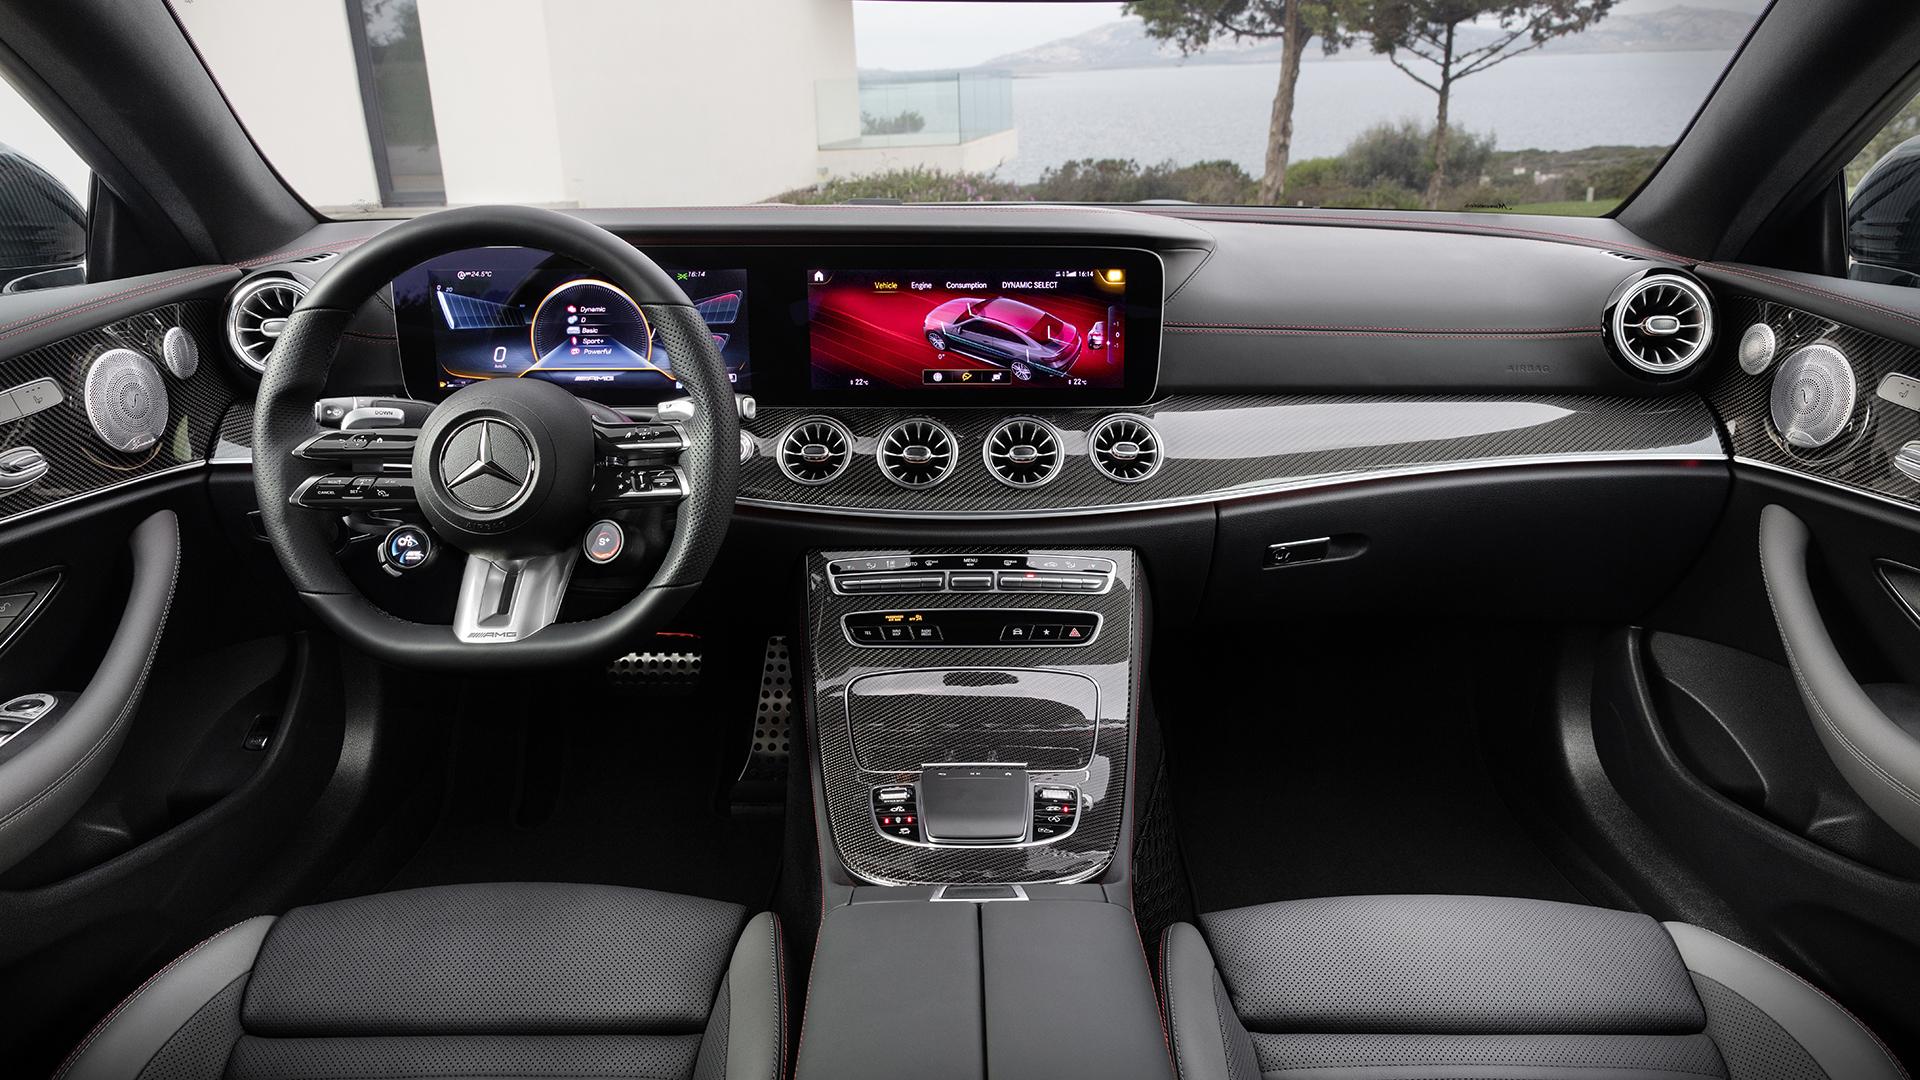 Mercedes-AMG e53 coupe interior